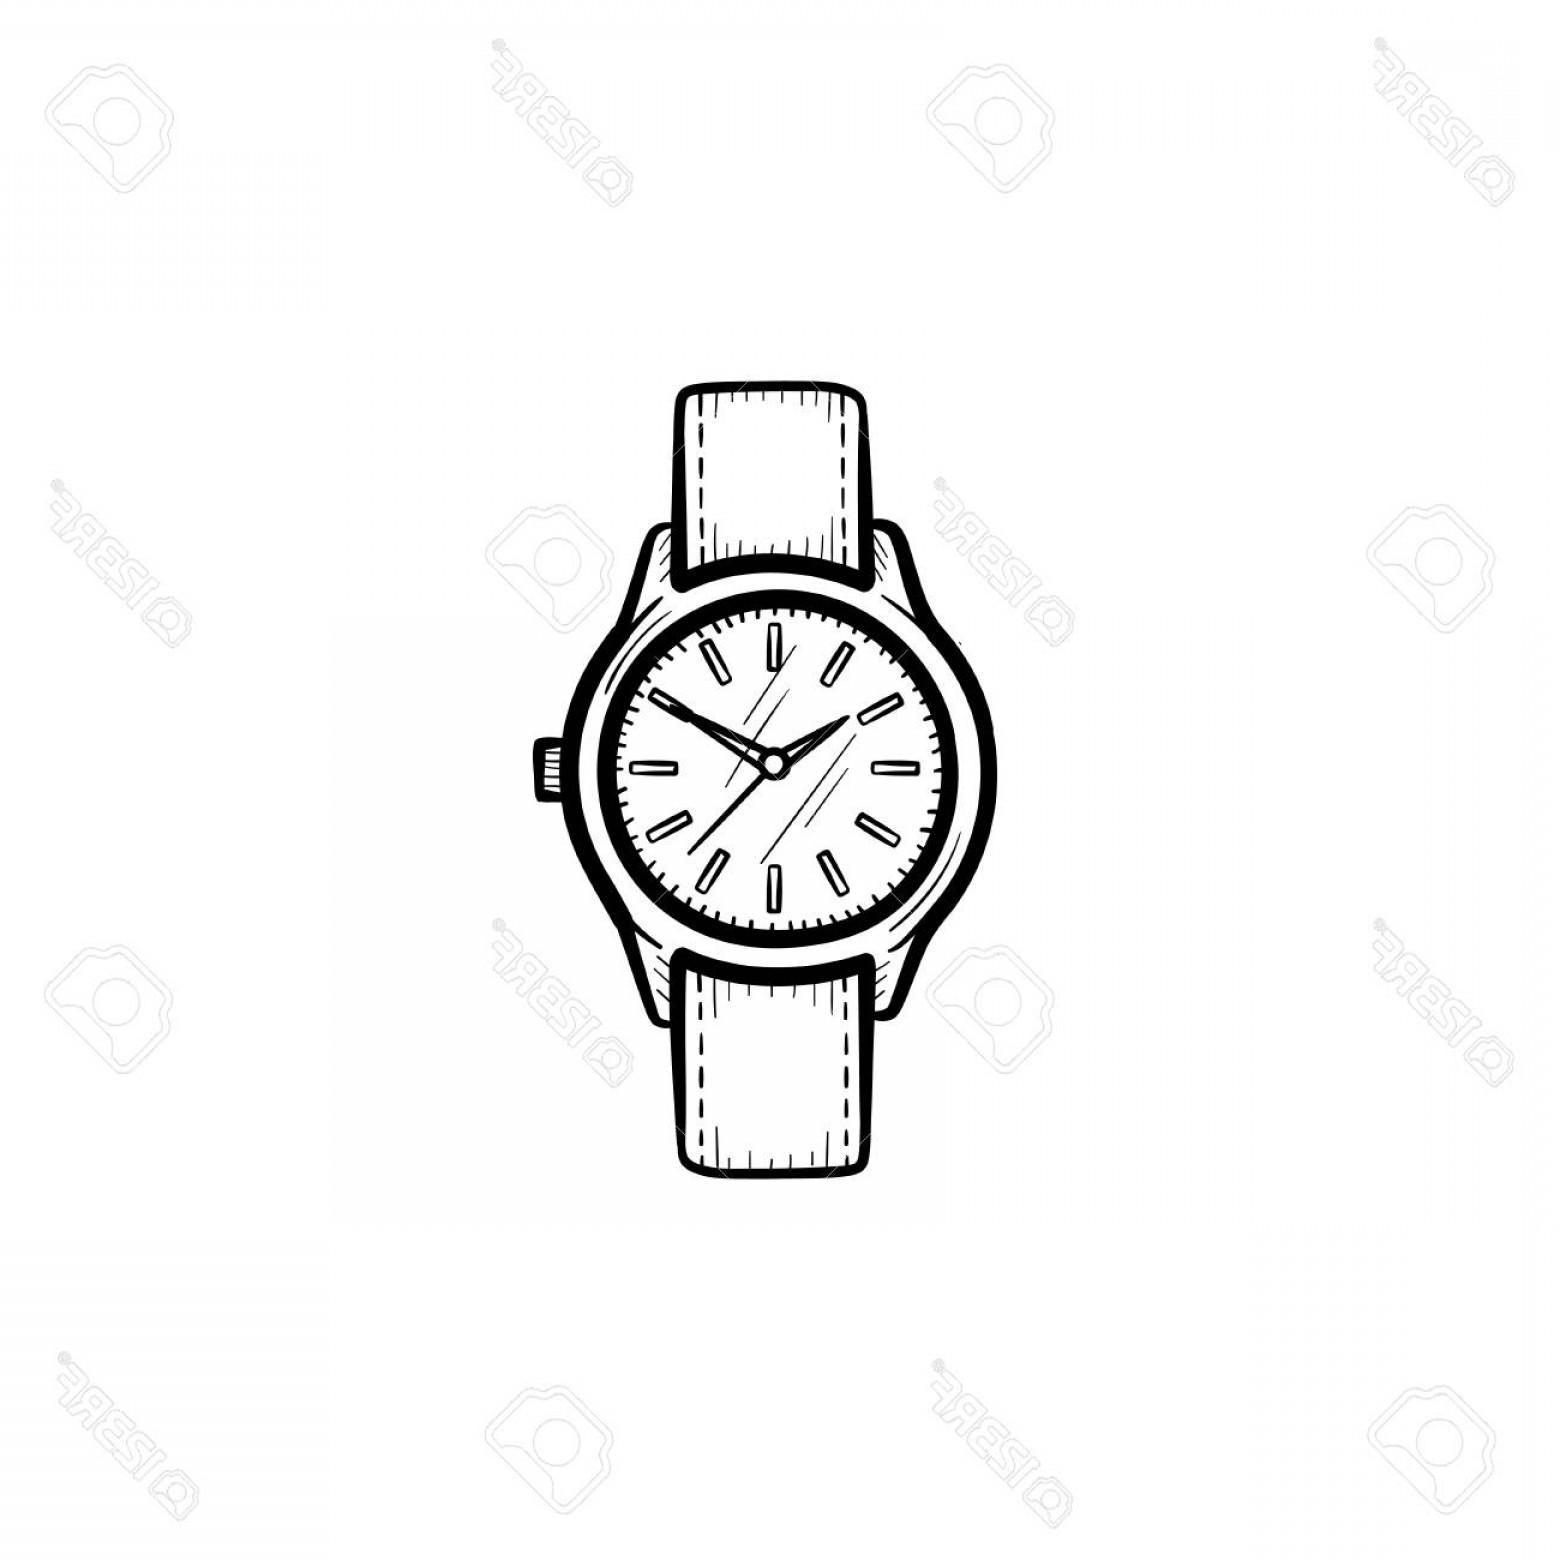 Wrist watch vector clipart clip freeuse library Photostock Vector A Vector Hand Drawn Wrist Watch Outline ... clip freeuse library